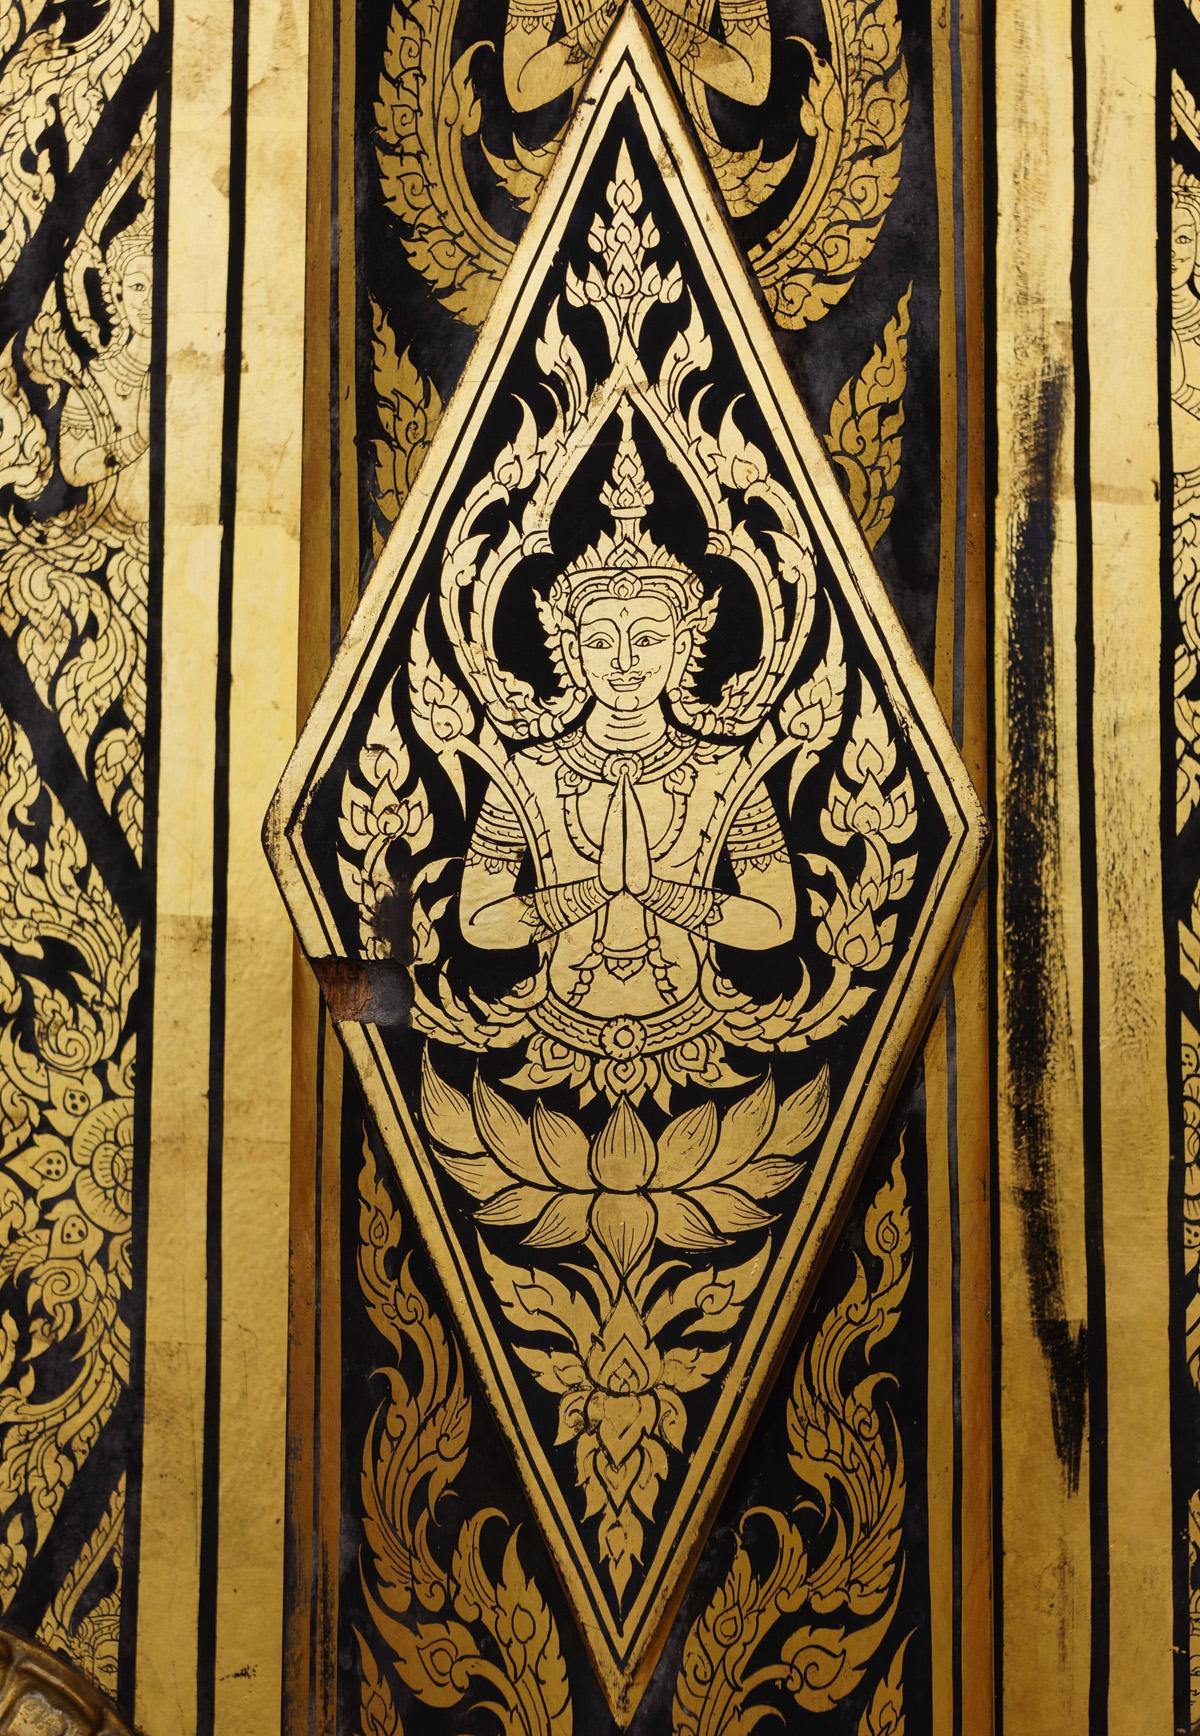 Beautiful design on the door to Wat Tham Pha Plong